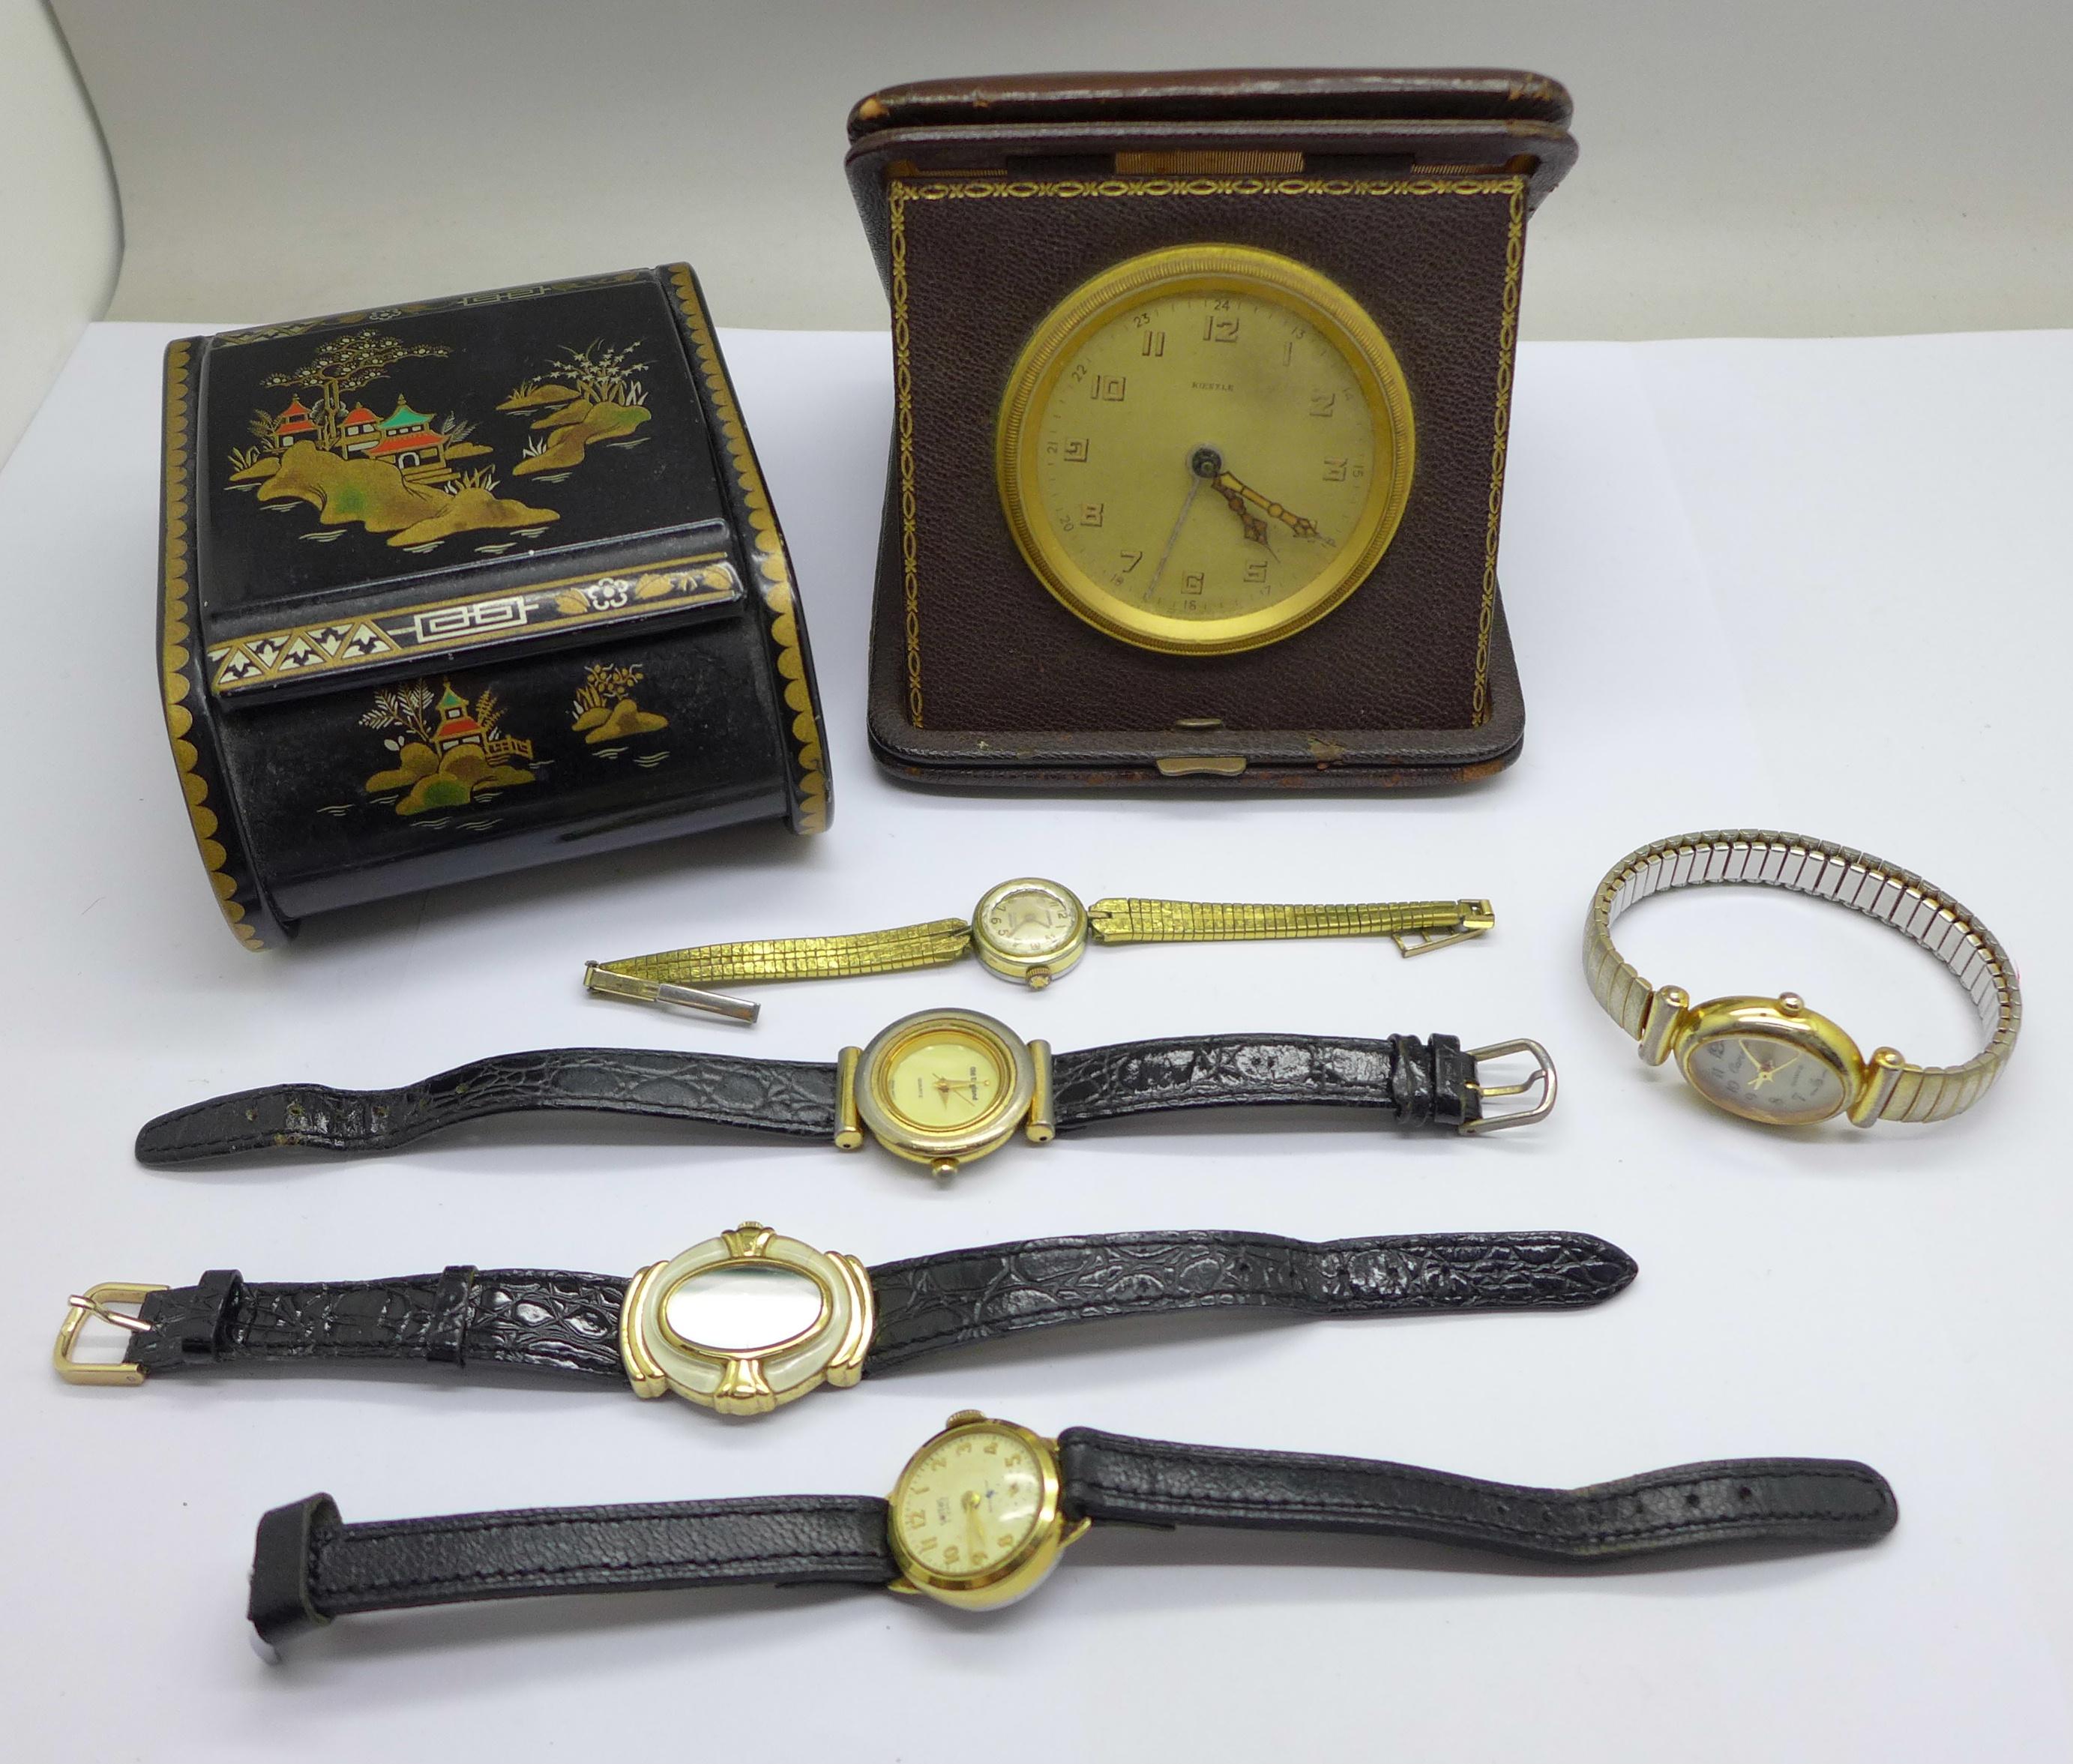 Five lady's wristwatches, a Kienzle travel clock and a trinket box